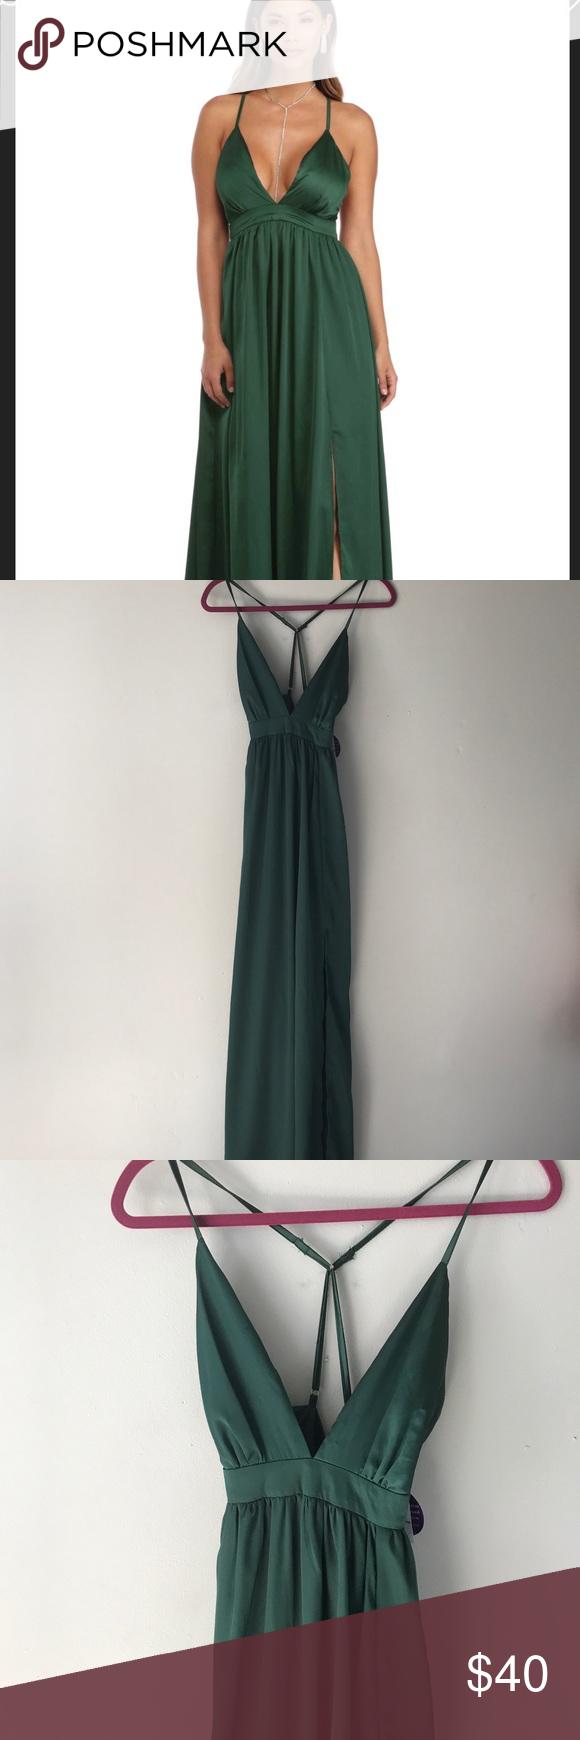 Nwt windsor emerald high slit prom dress nwt my posh picks